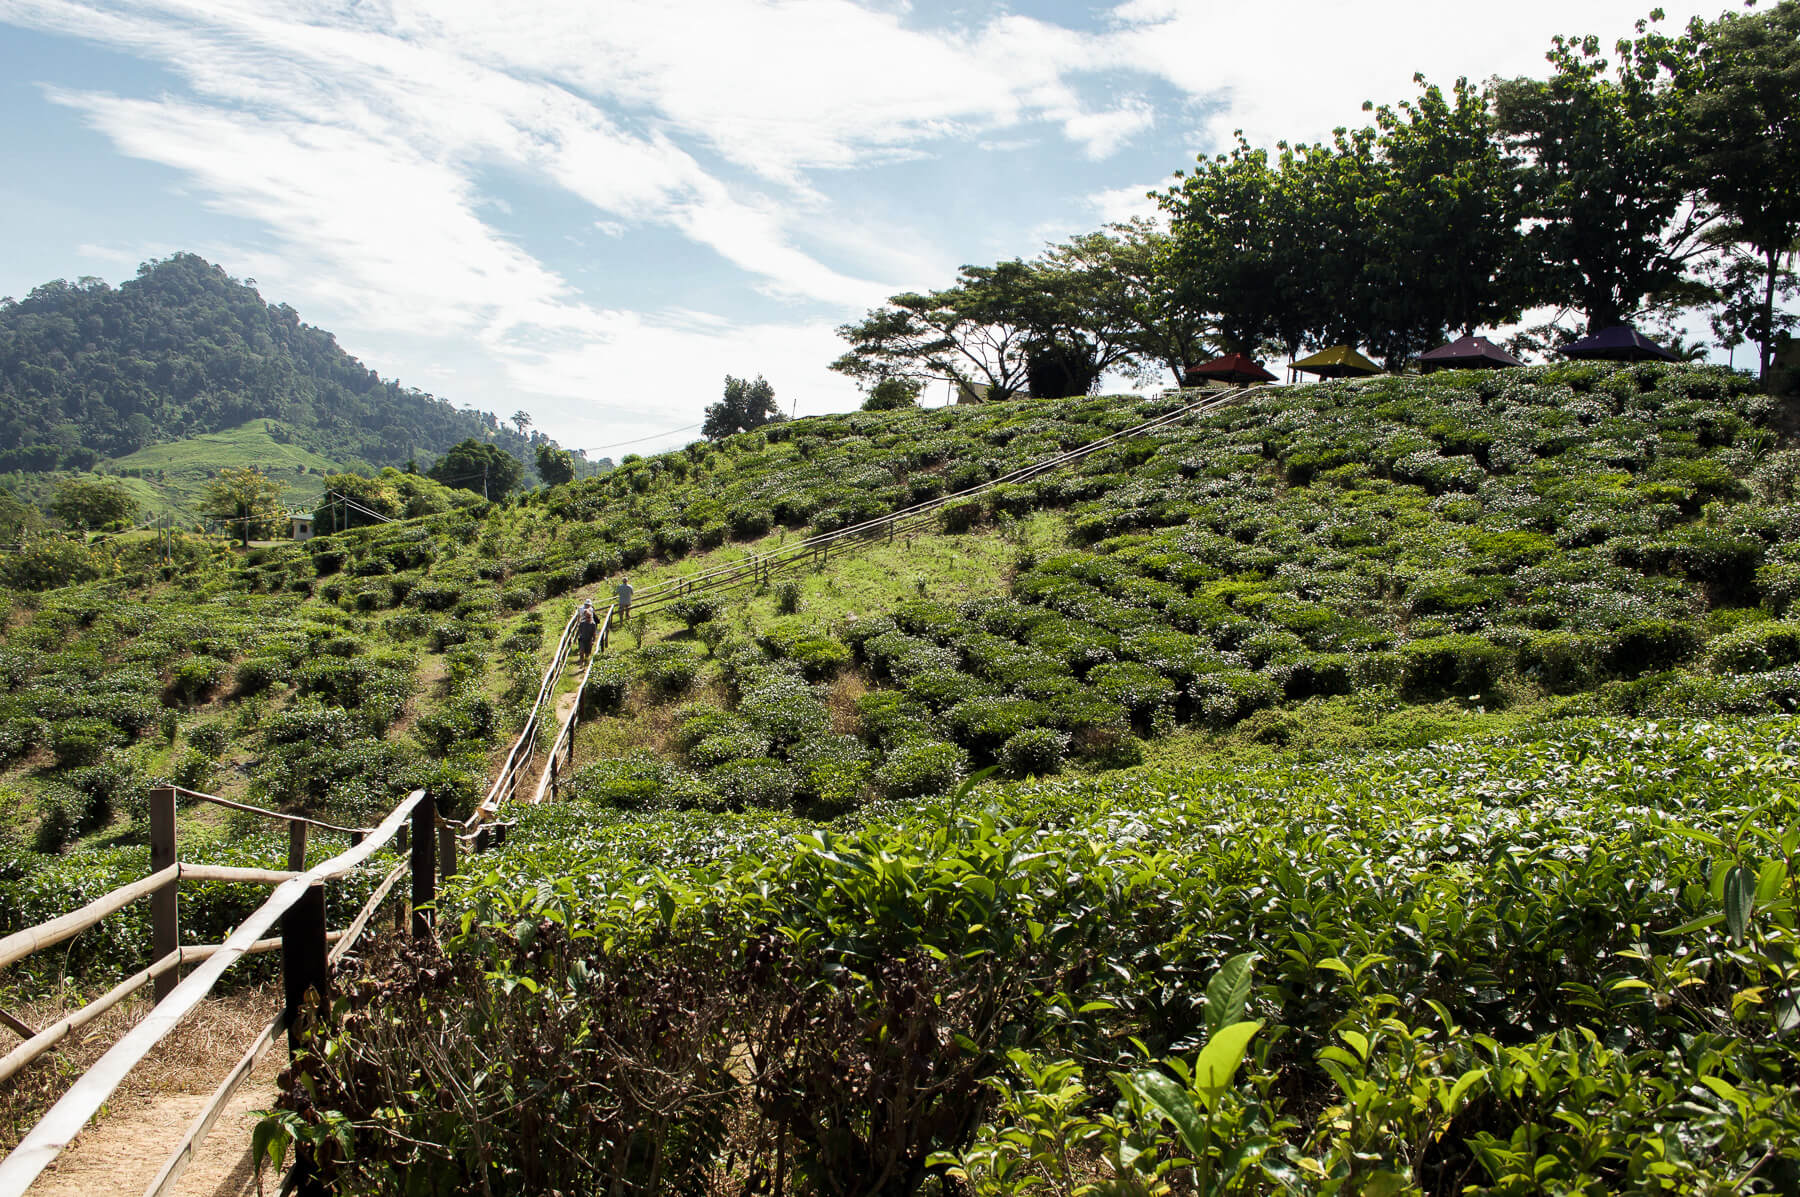 Path way walking through a Tea Plantation